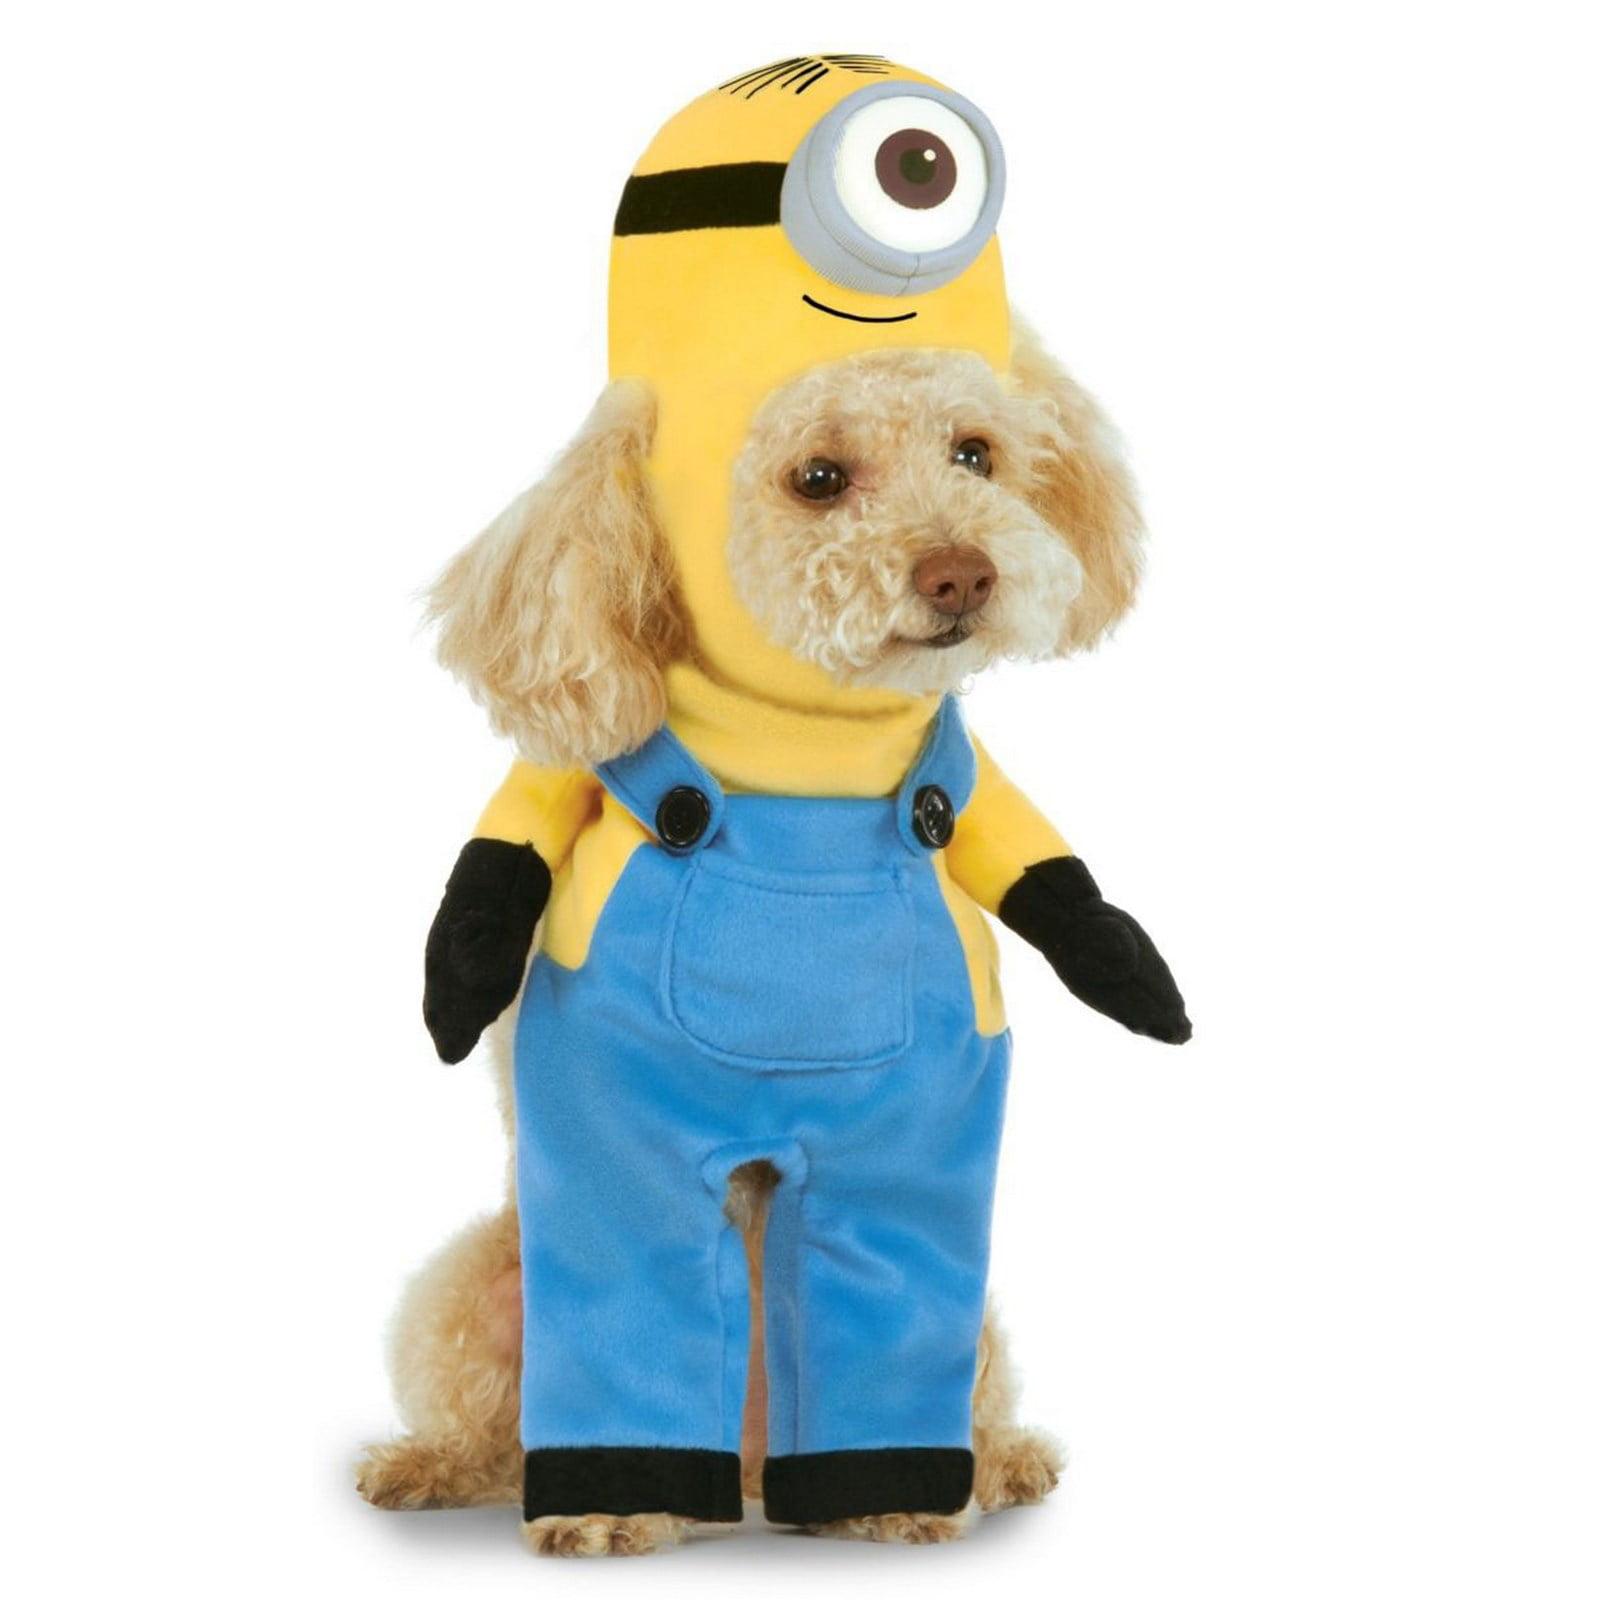 Halloween Minion Stuart Arms Pet Co Pet Costume